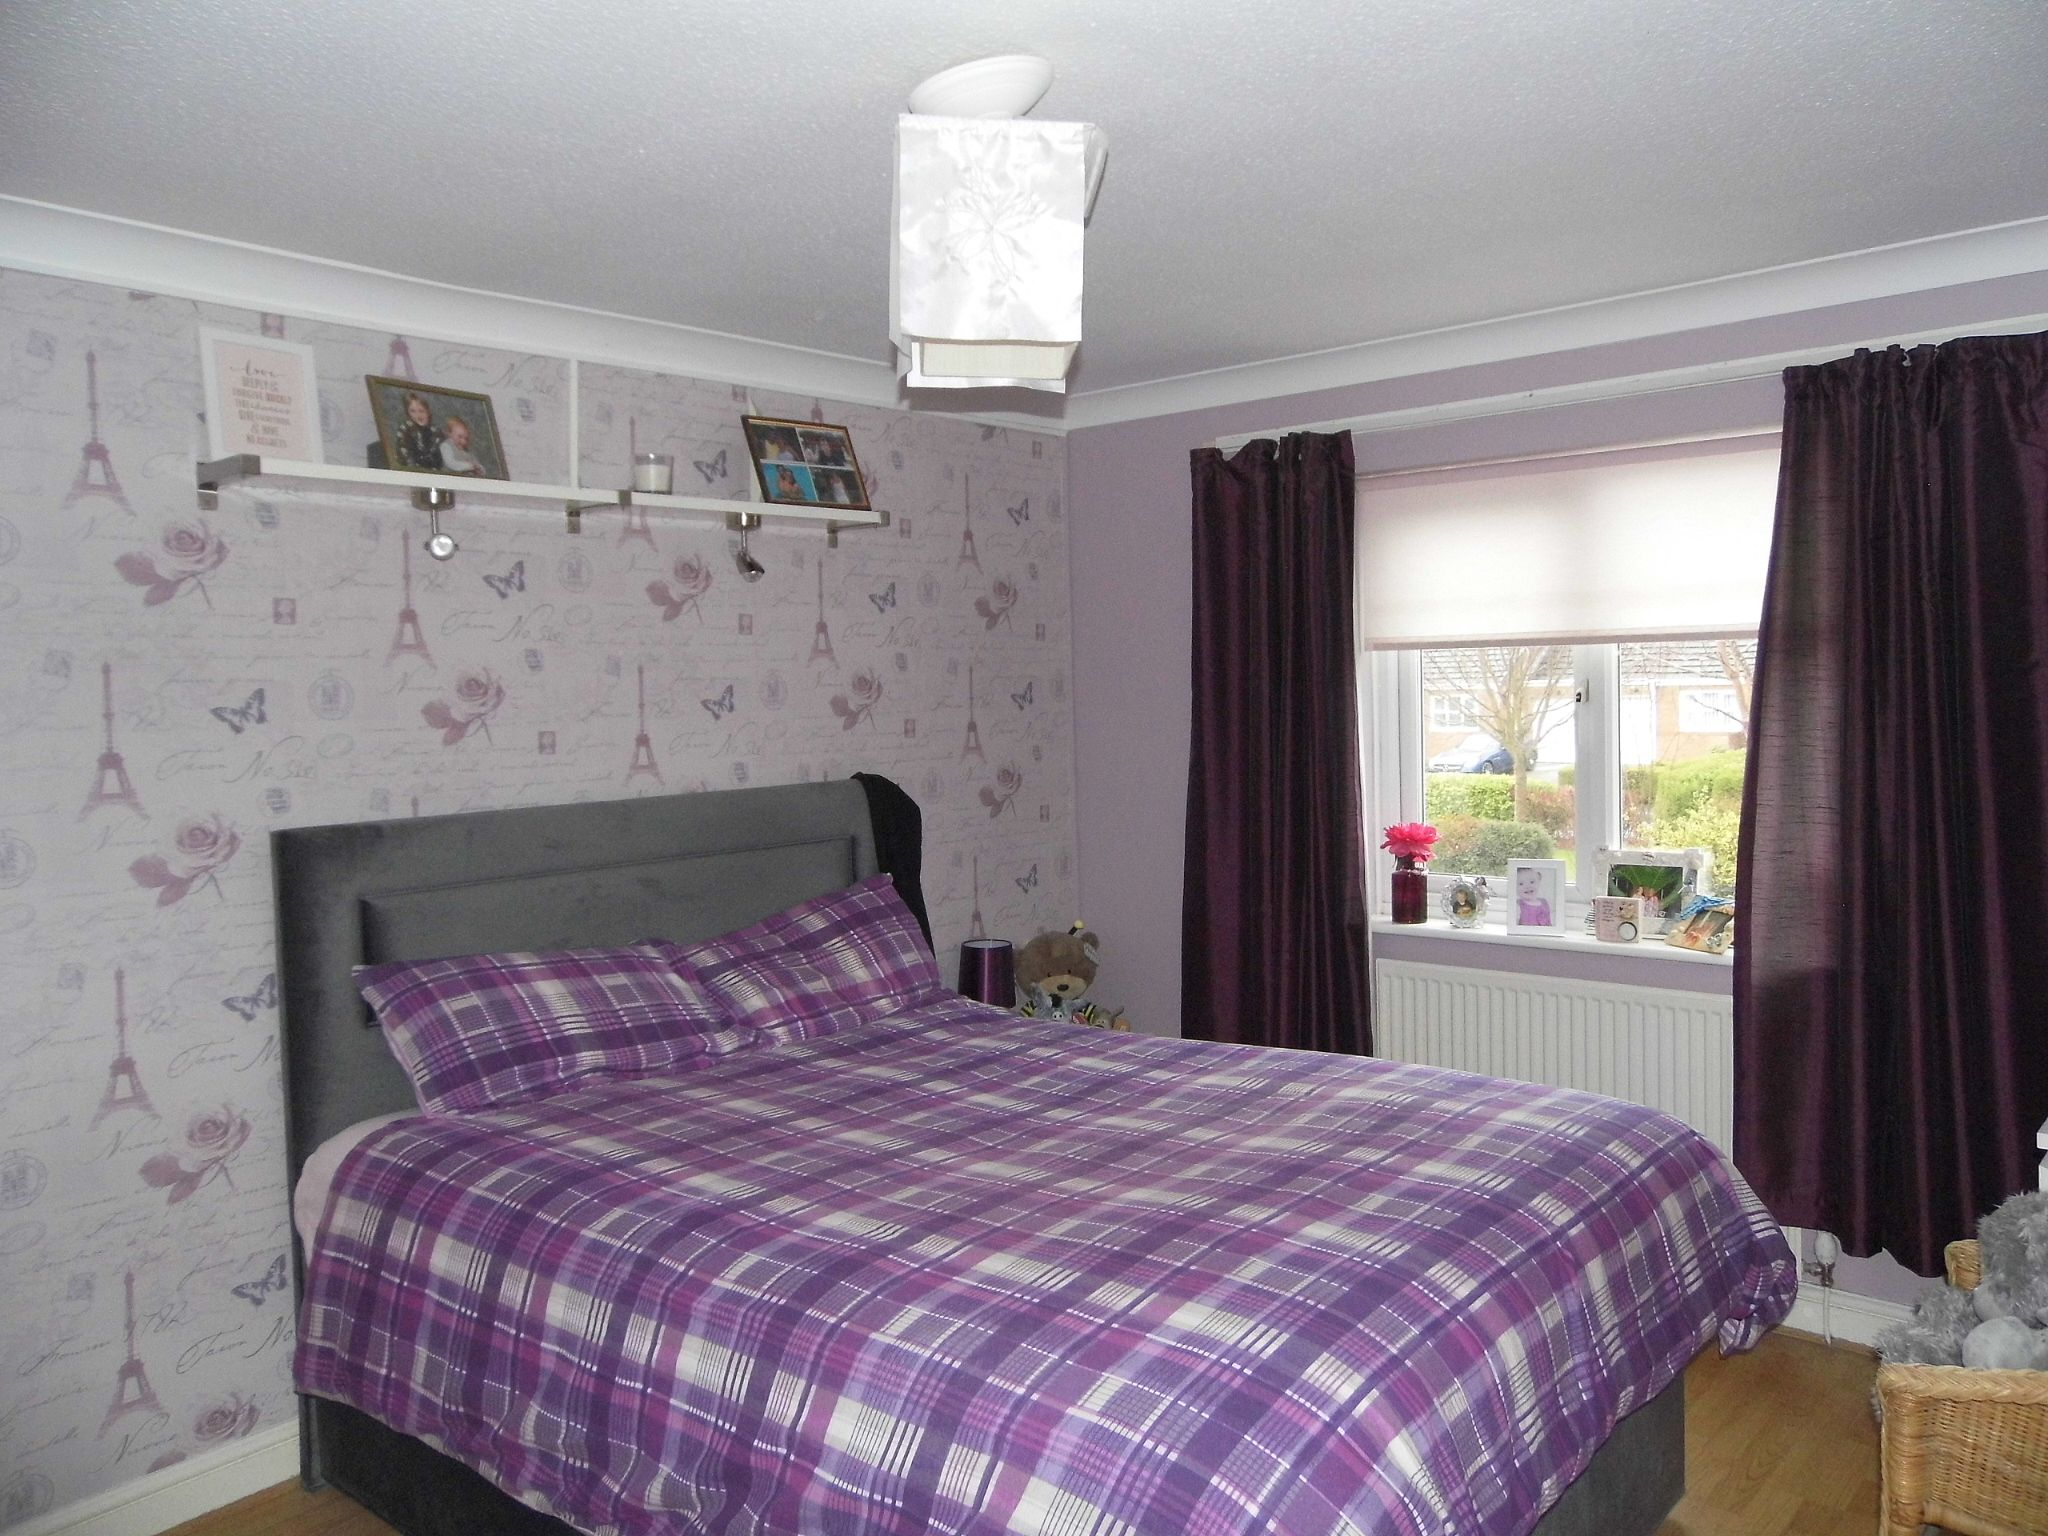 4 bedroom detached house SSTC in Bishop Auckland - Master Bedroom.